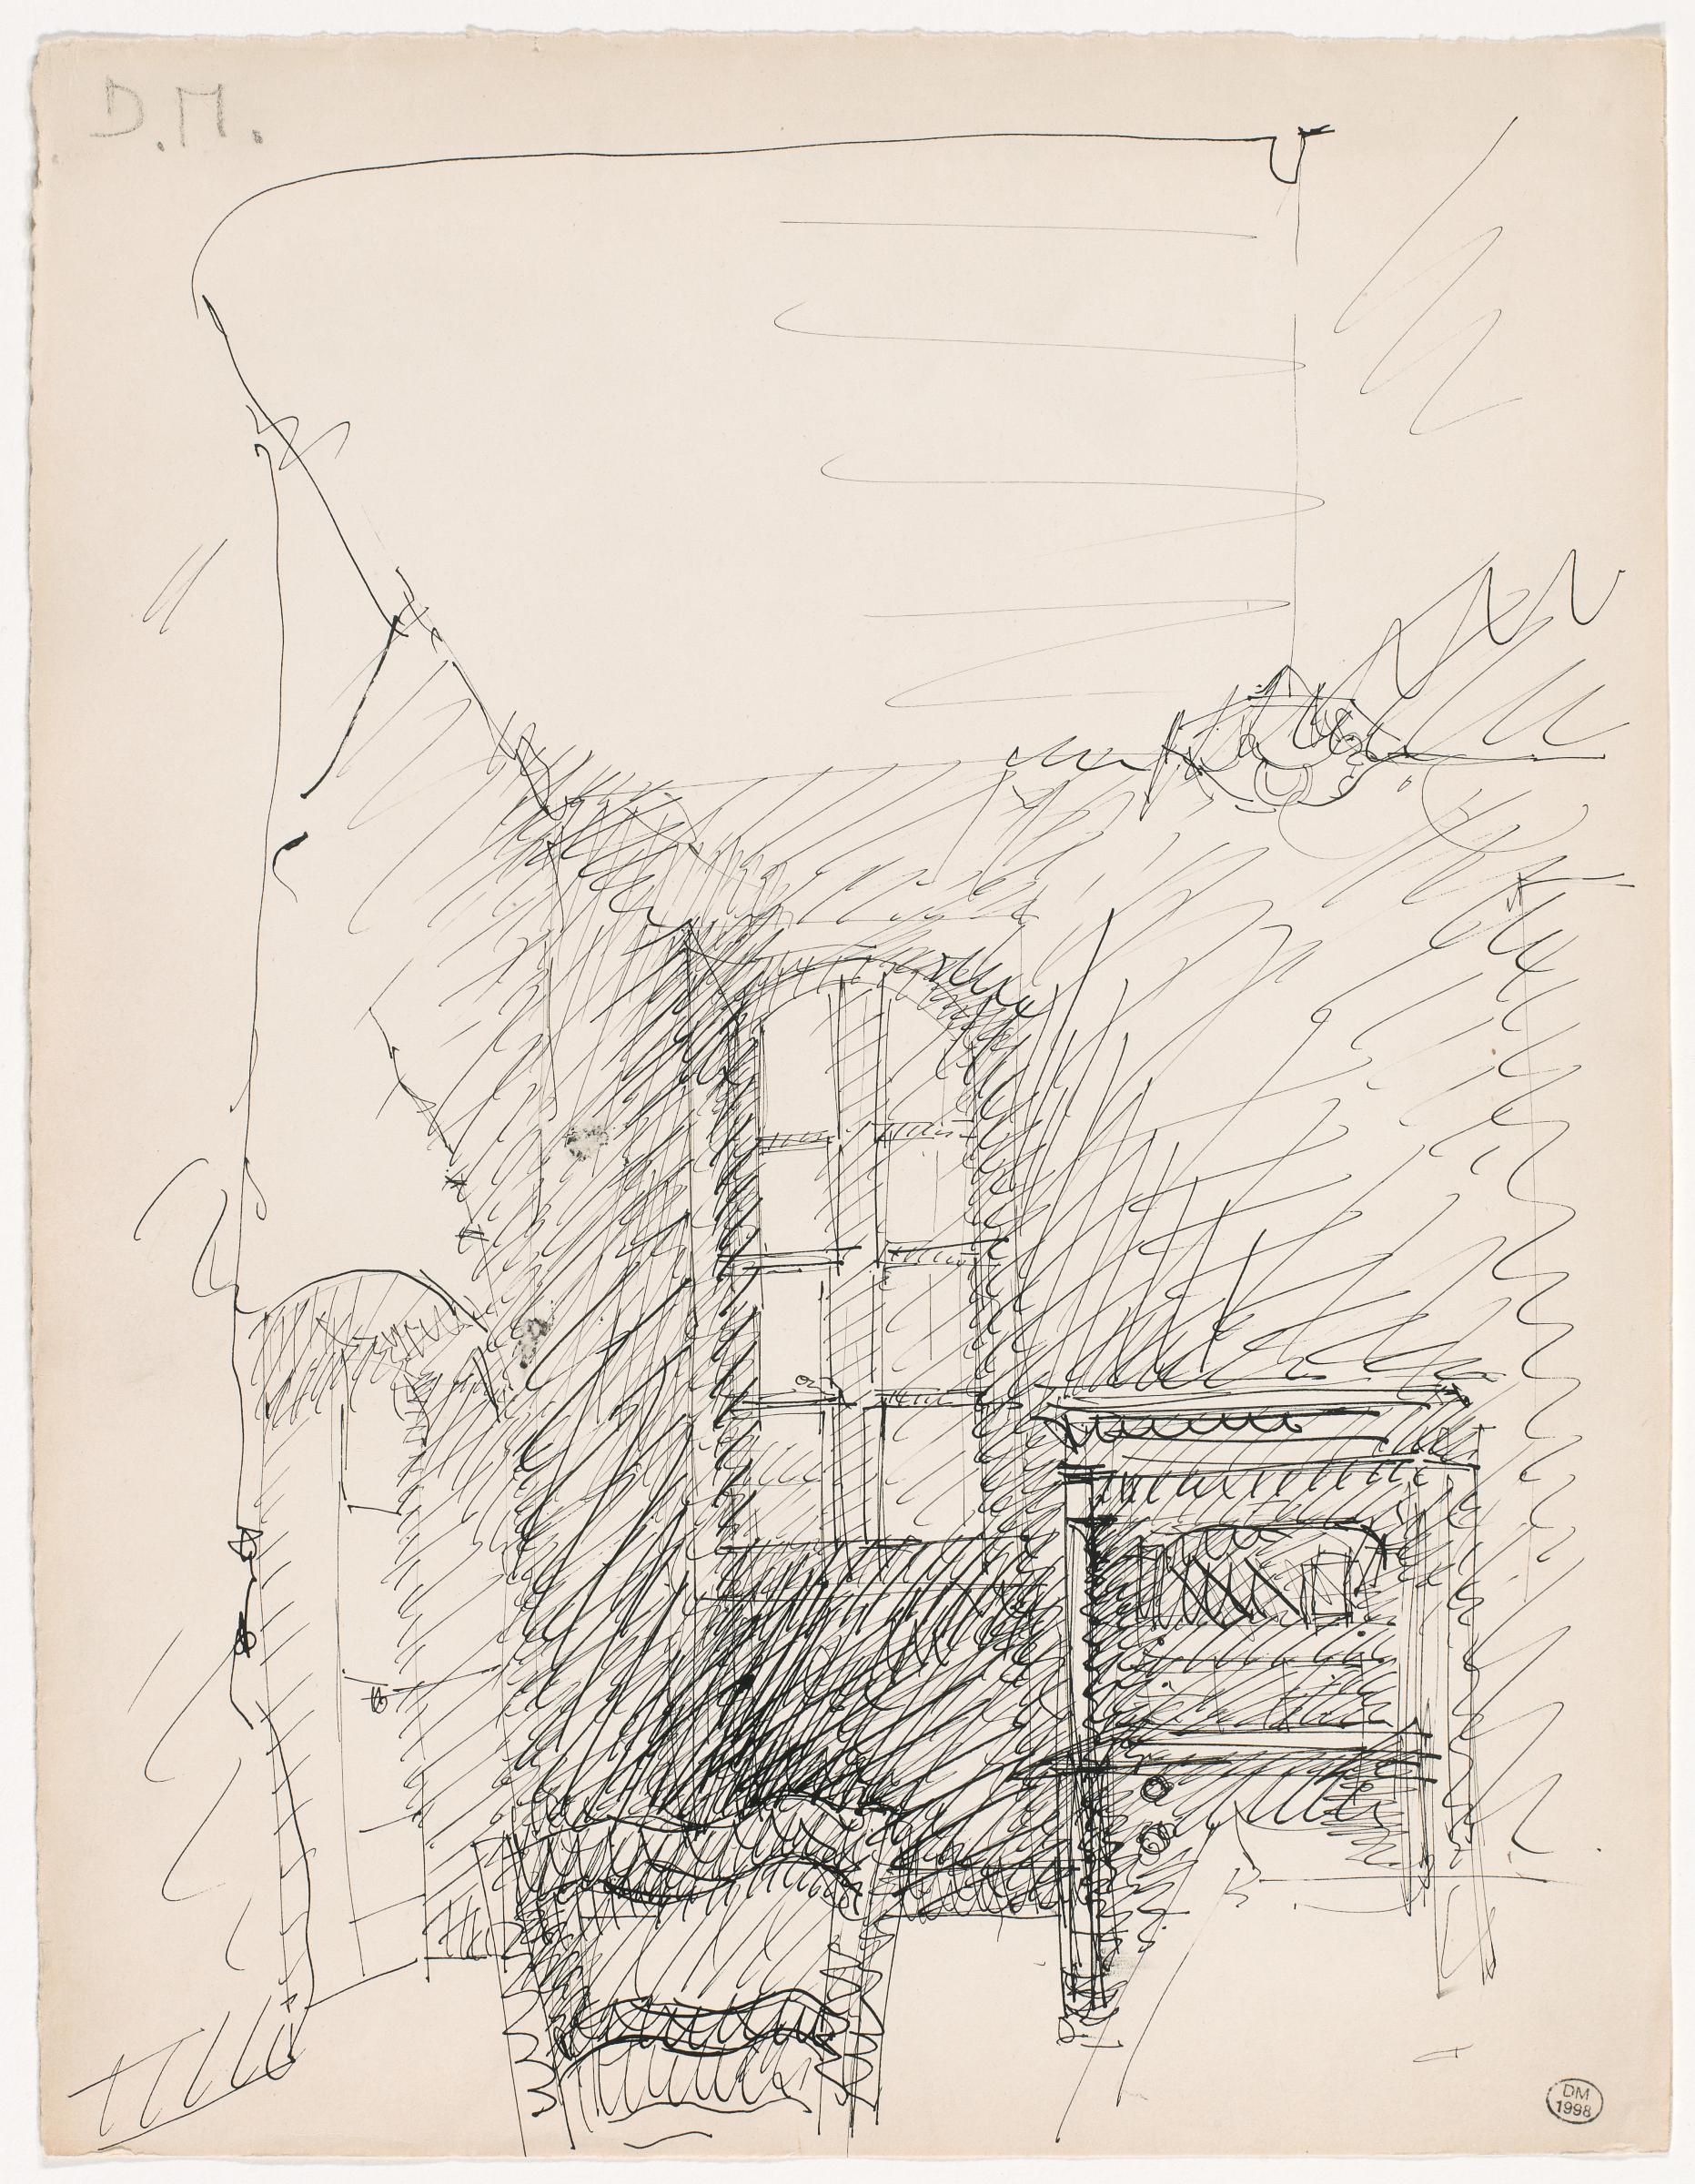 FOR DORA MAAR SYMPOSIUM ONLY - dora maar ink drawing of house